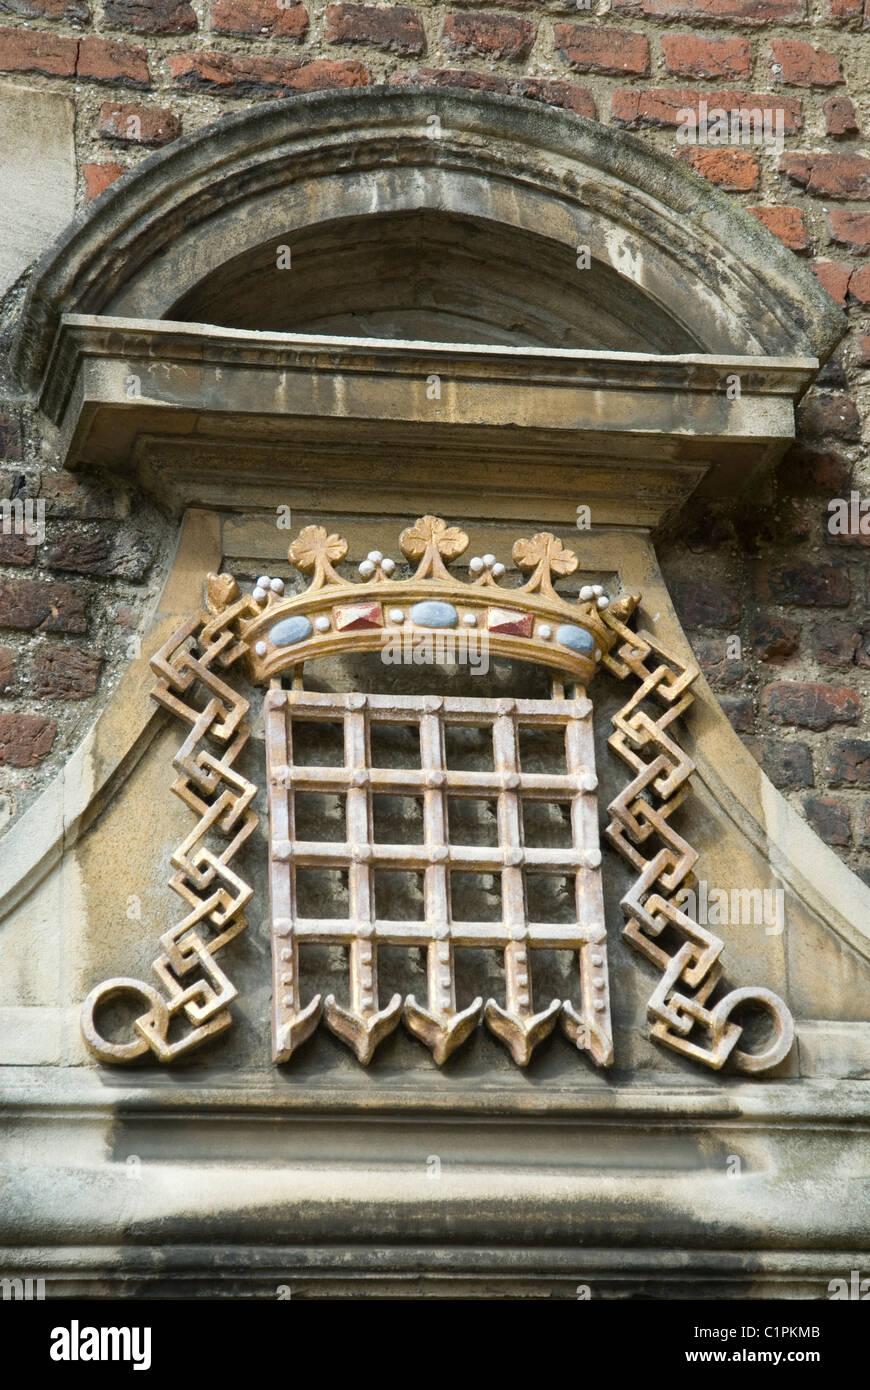 England, Cambridge, Portico carving - Stock Image